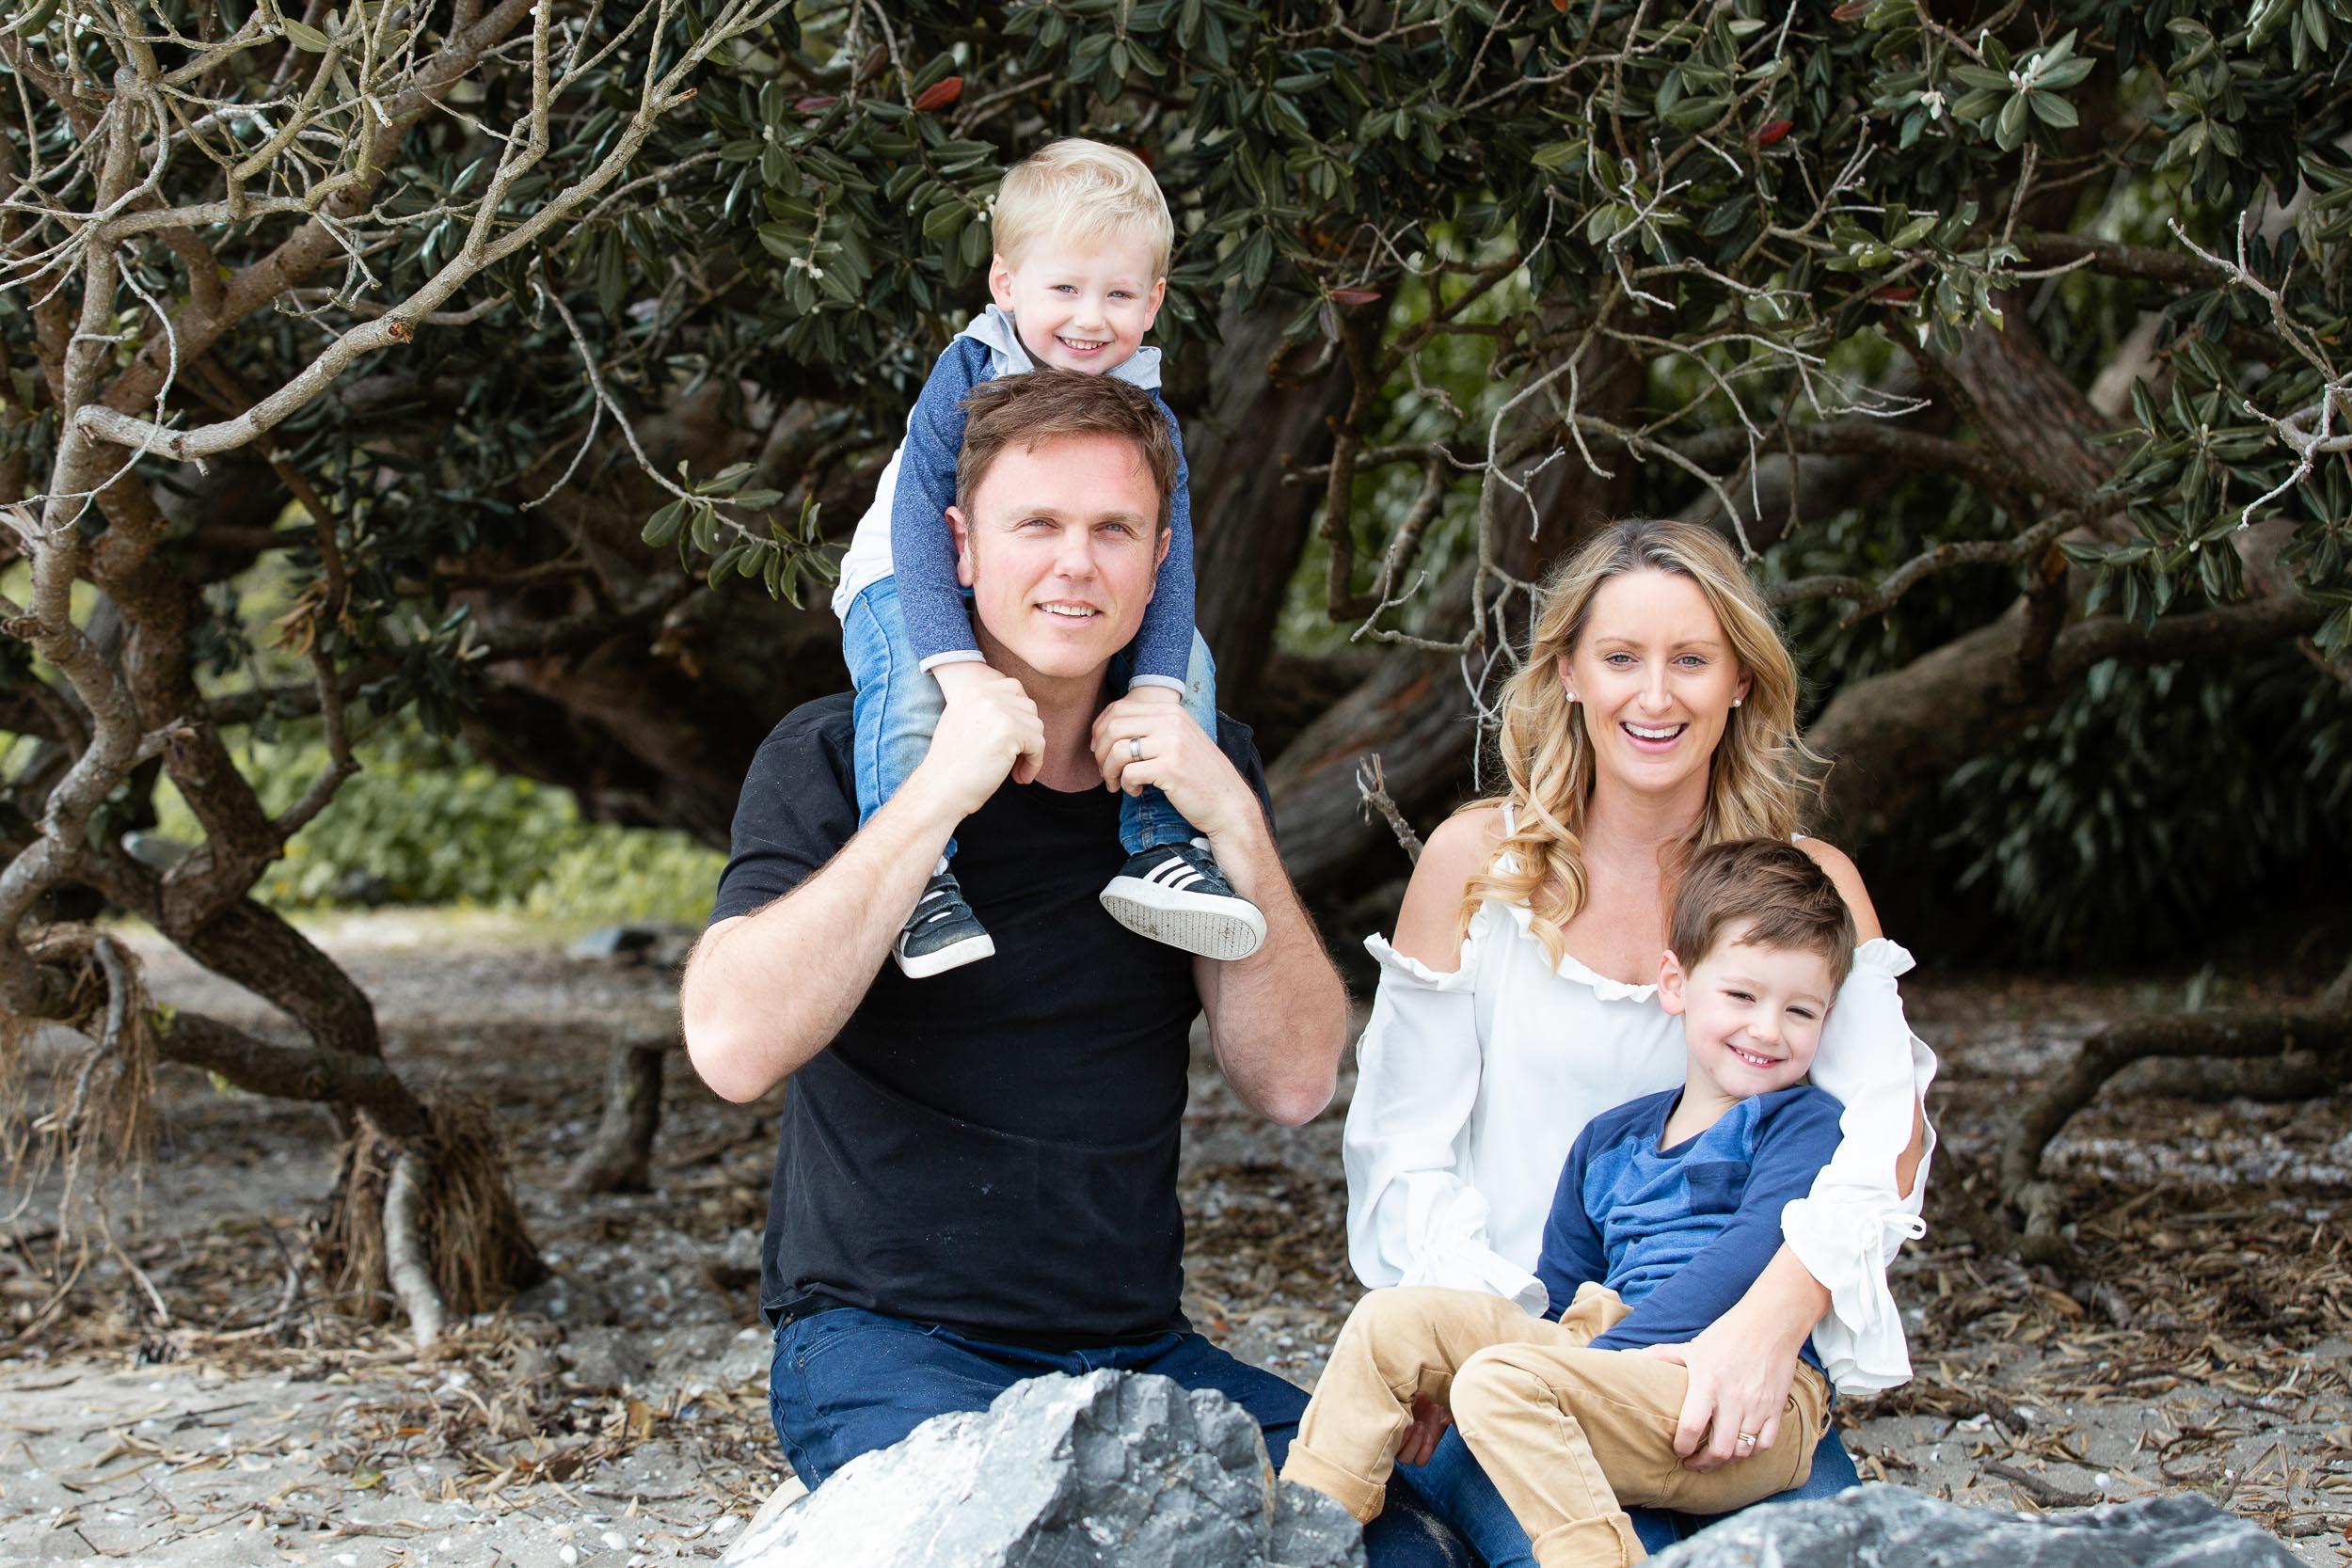 Aucklandfamilyphotographer (10 of 15).jpg